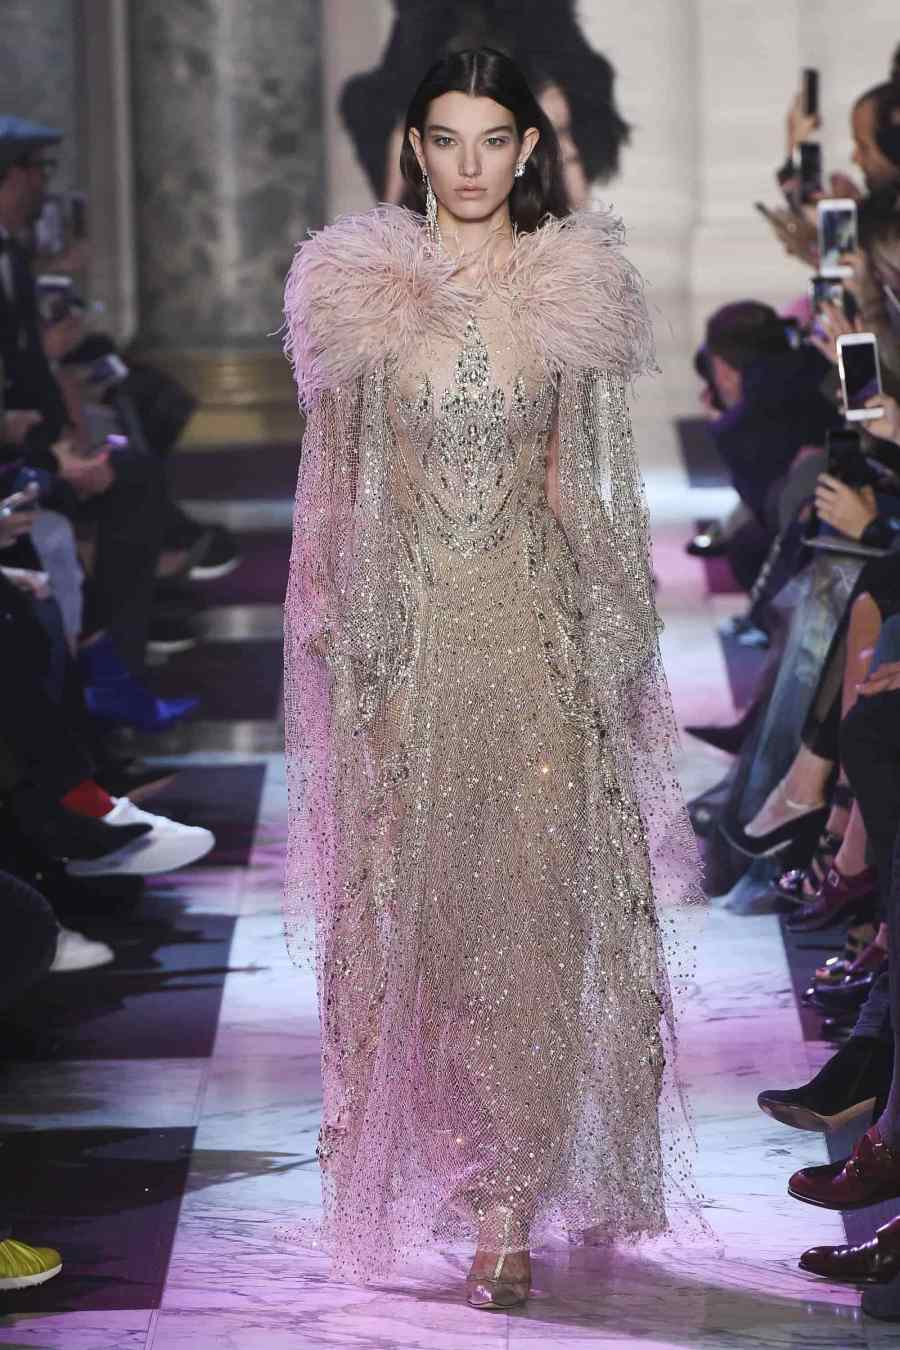 Paris Haute Couture Fashion Week 2018 - Elie Saab